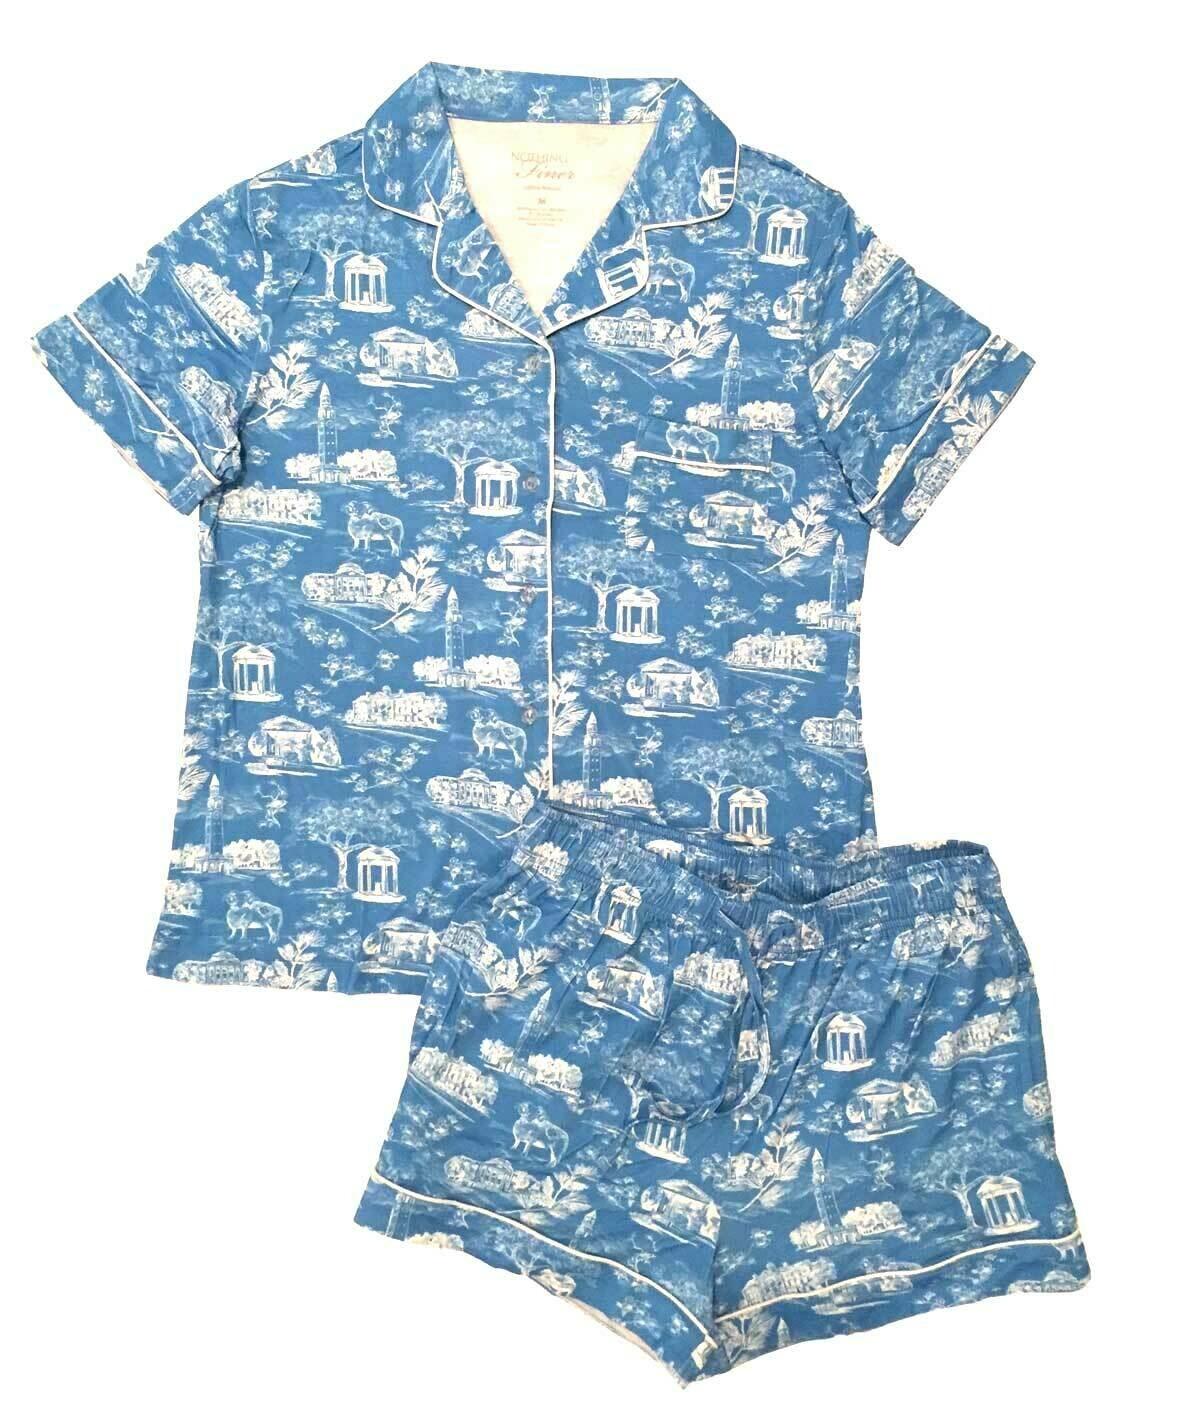 Shorts — Short Sleeves — Blue